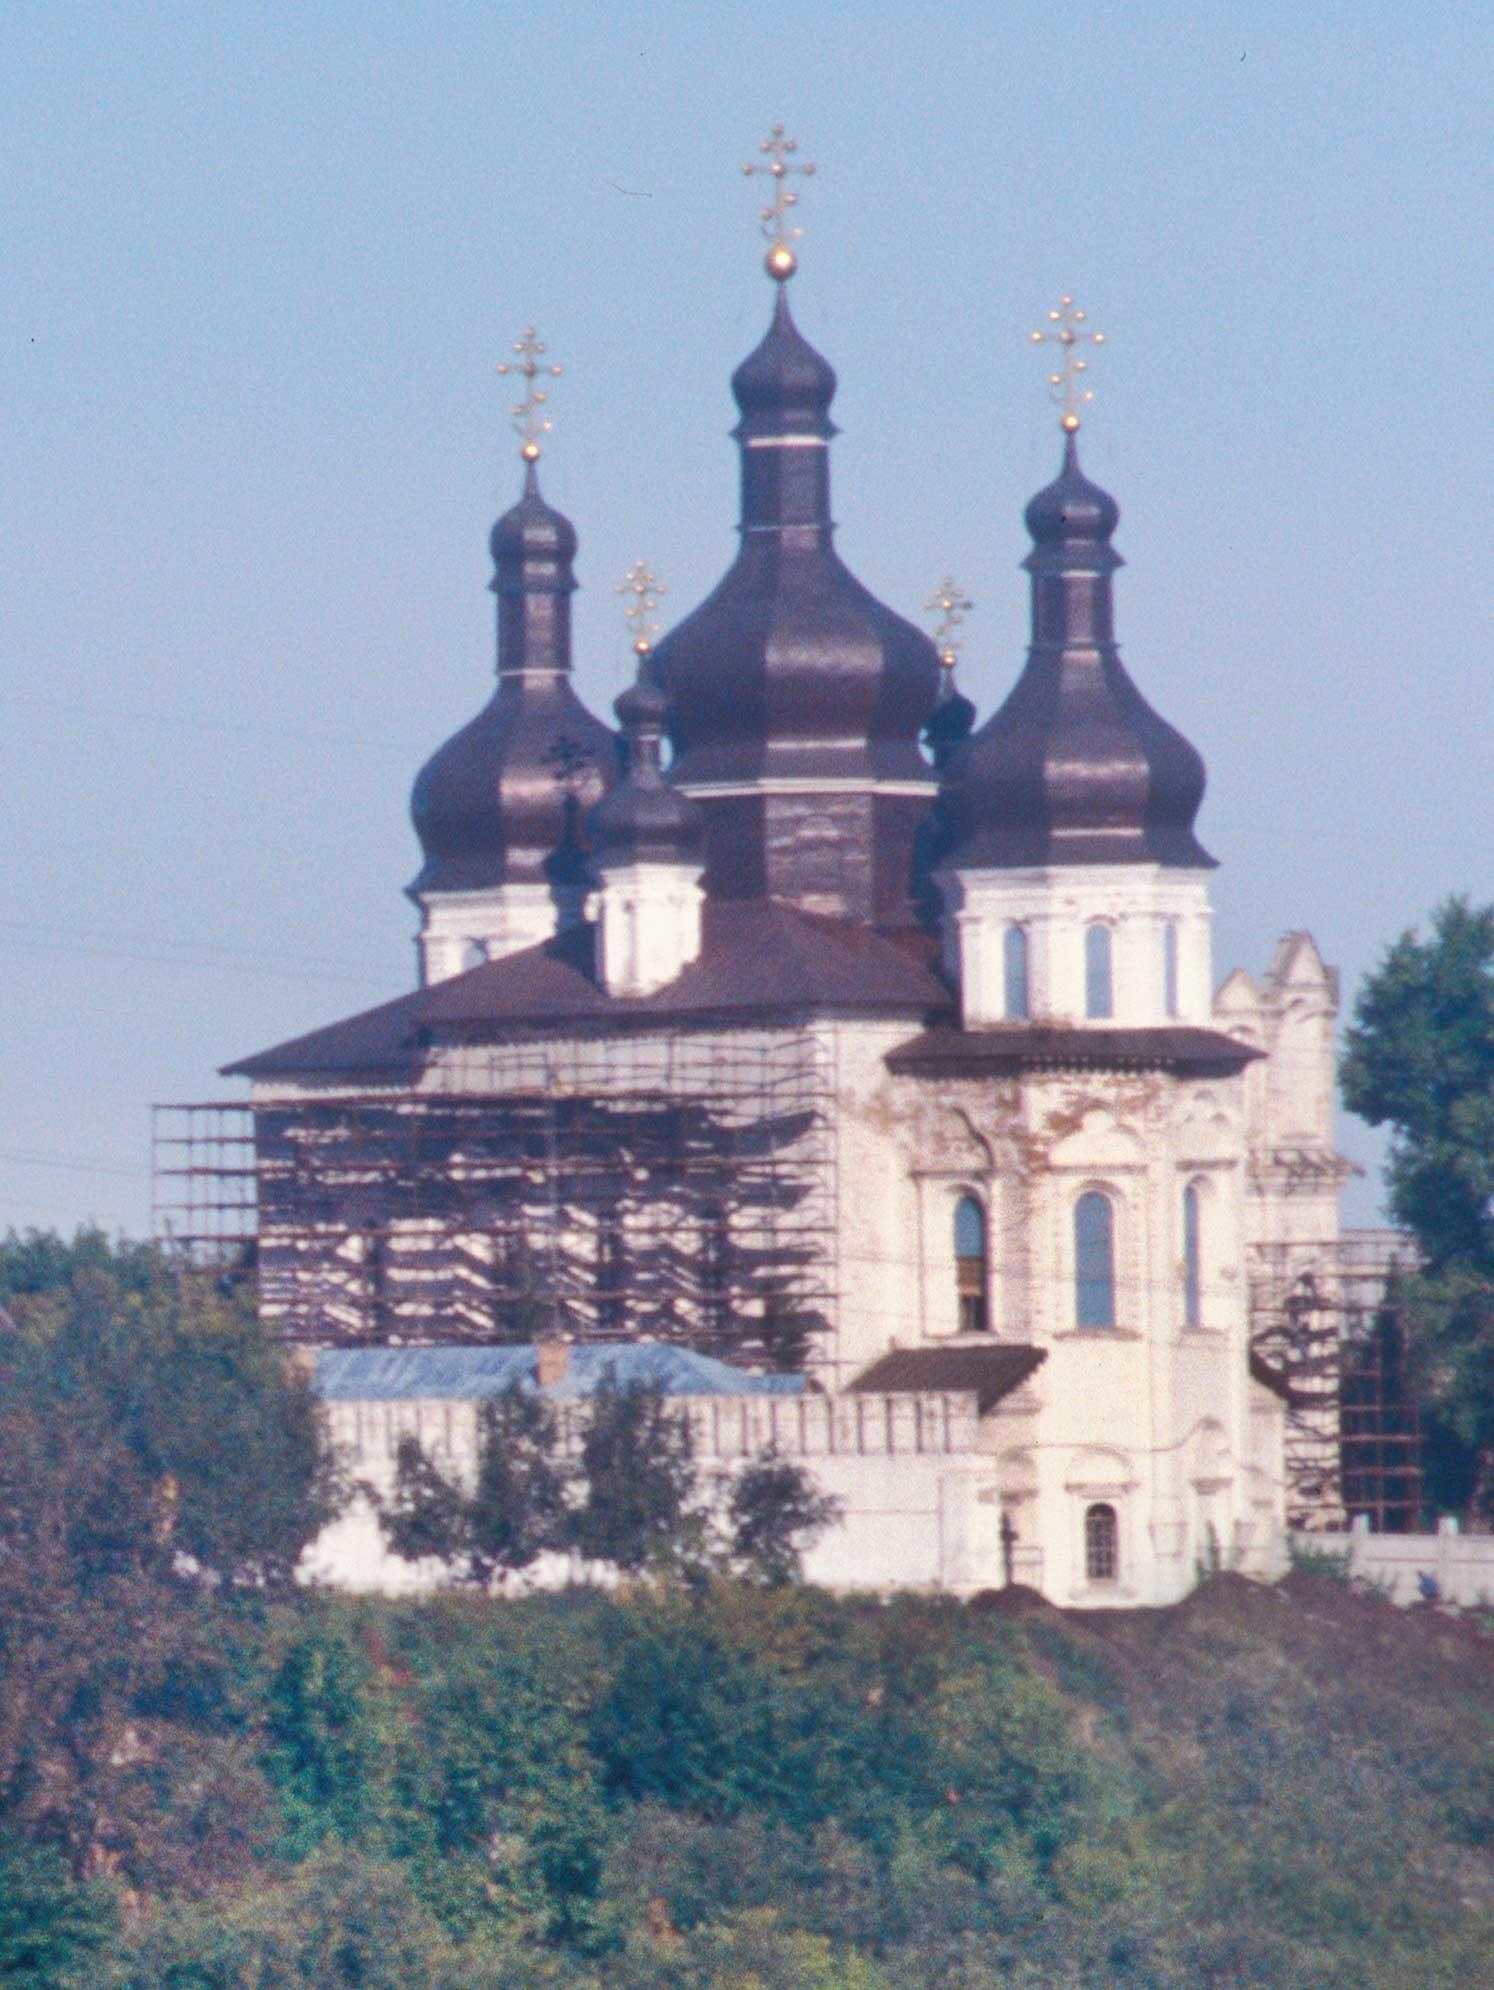 Trinity Monastery. Trinity Cathedral, southeast view across Tura River. Sept. 4, 1999.